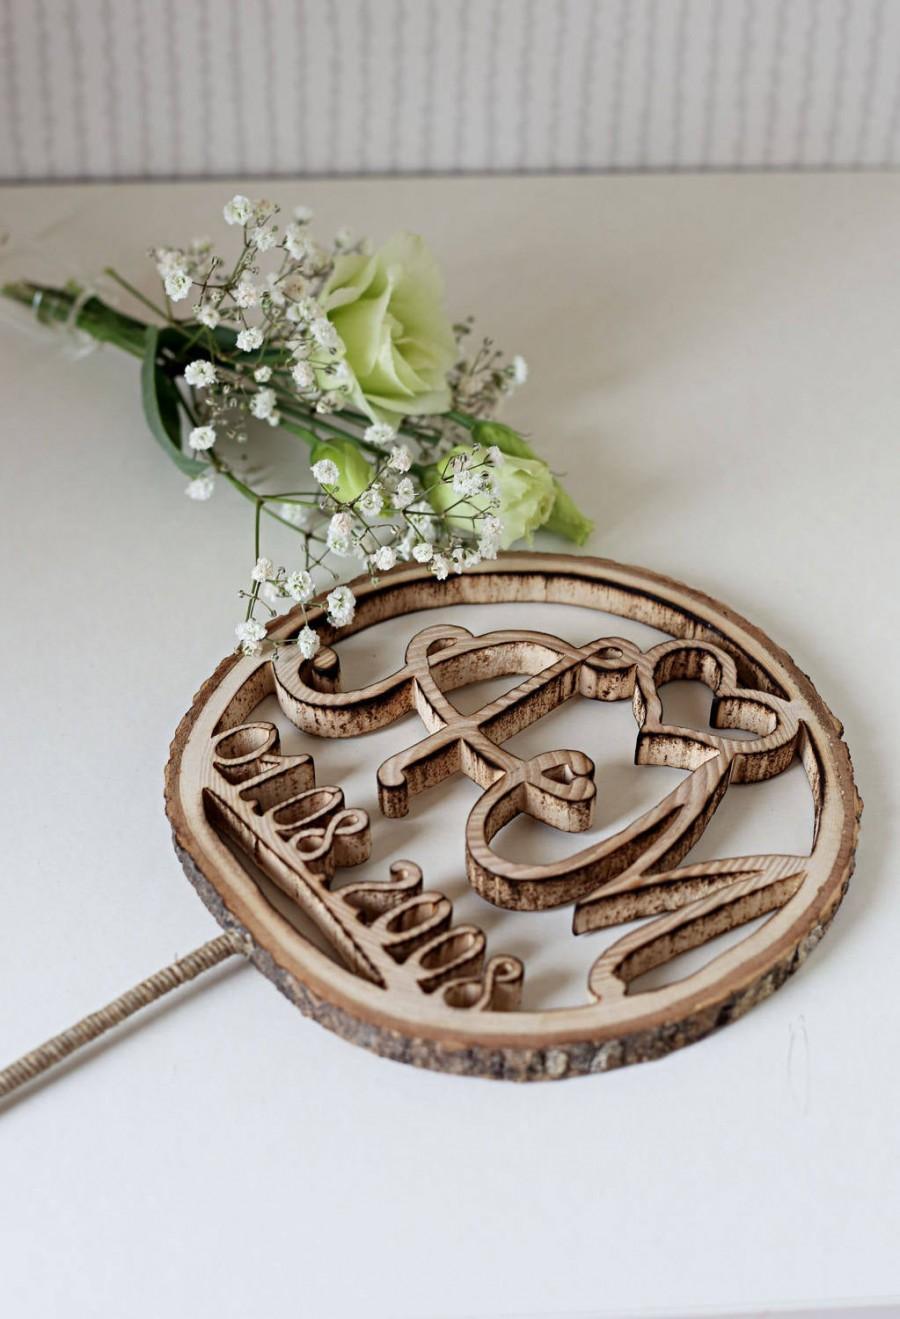 Wedding - Wedding cake topper, Rustic cake decor,  Personalized Cake Topper,  Wood slice cake topper, Initials cake topper, Rustic cake topper, Boho